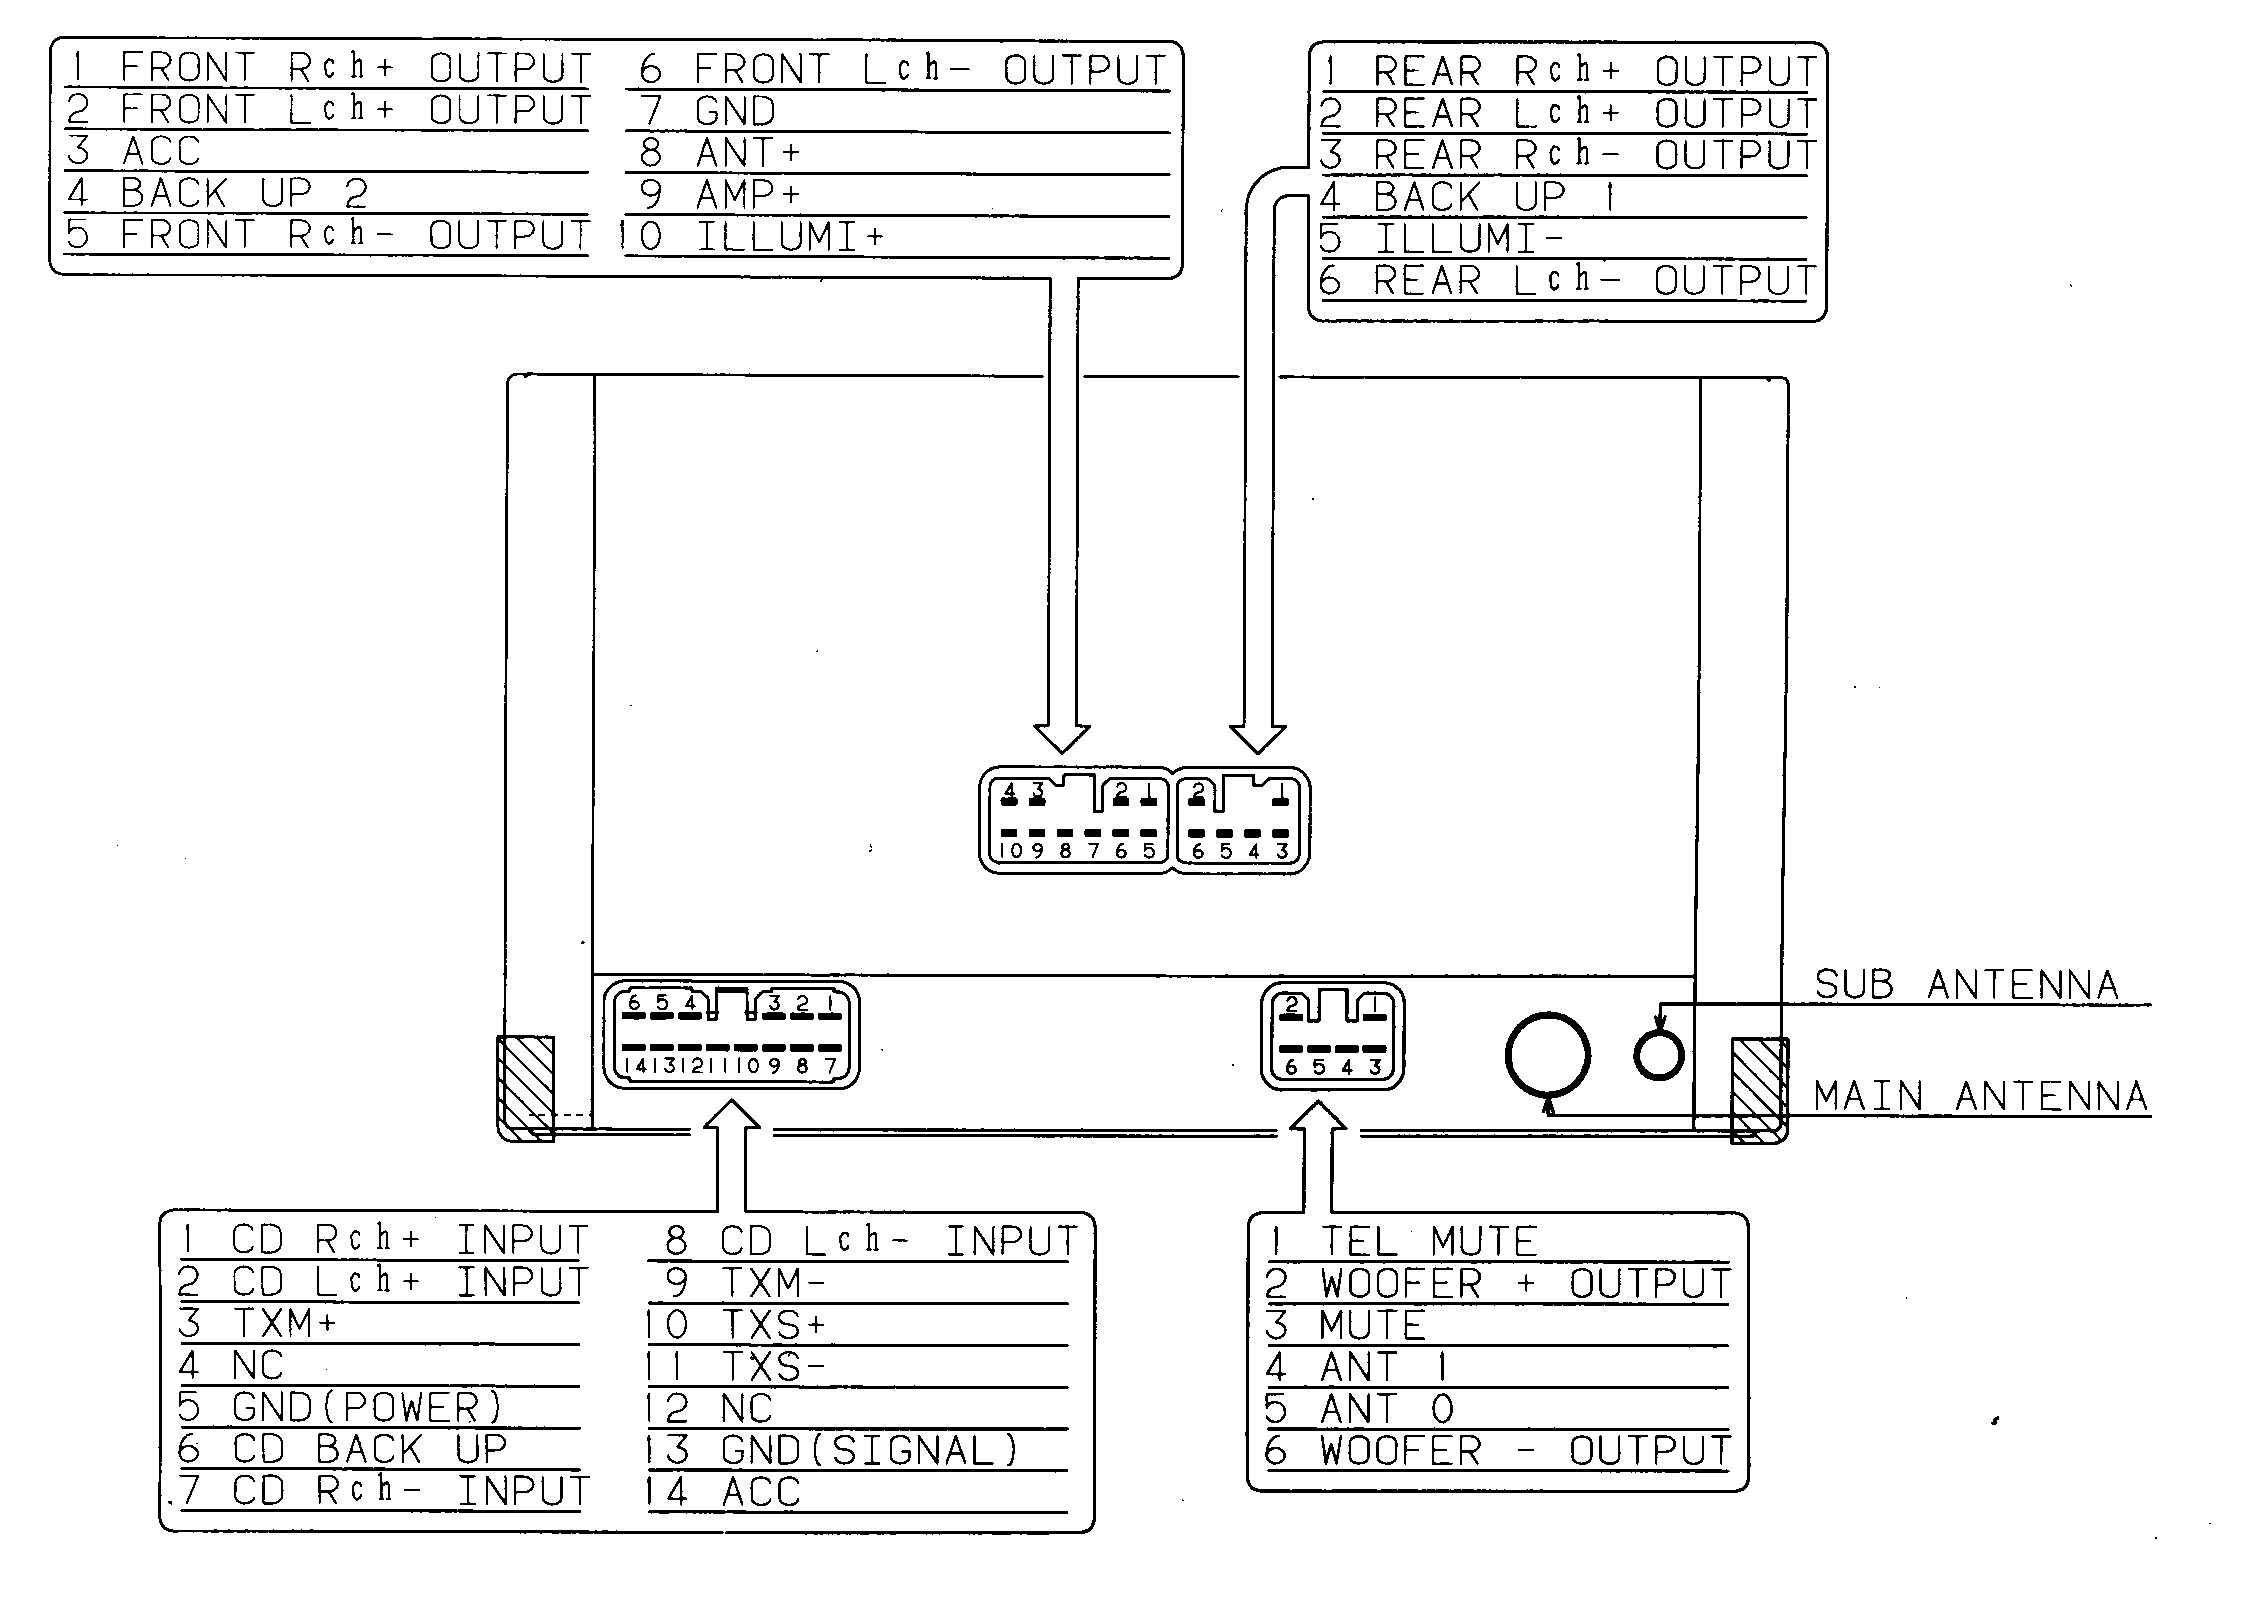 small resolution of lexus lx470 headlight wiring harness wiring diagram expert lexus lx470 headlight wiring harness